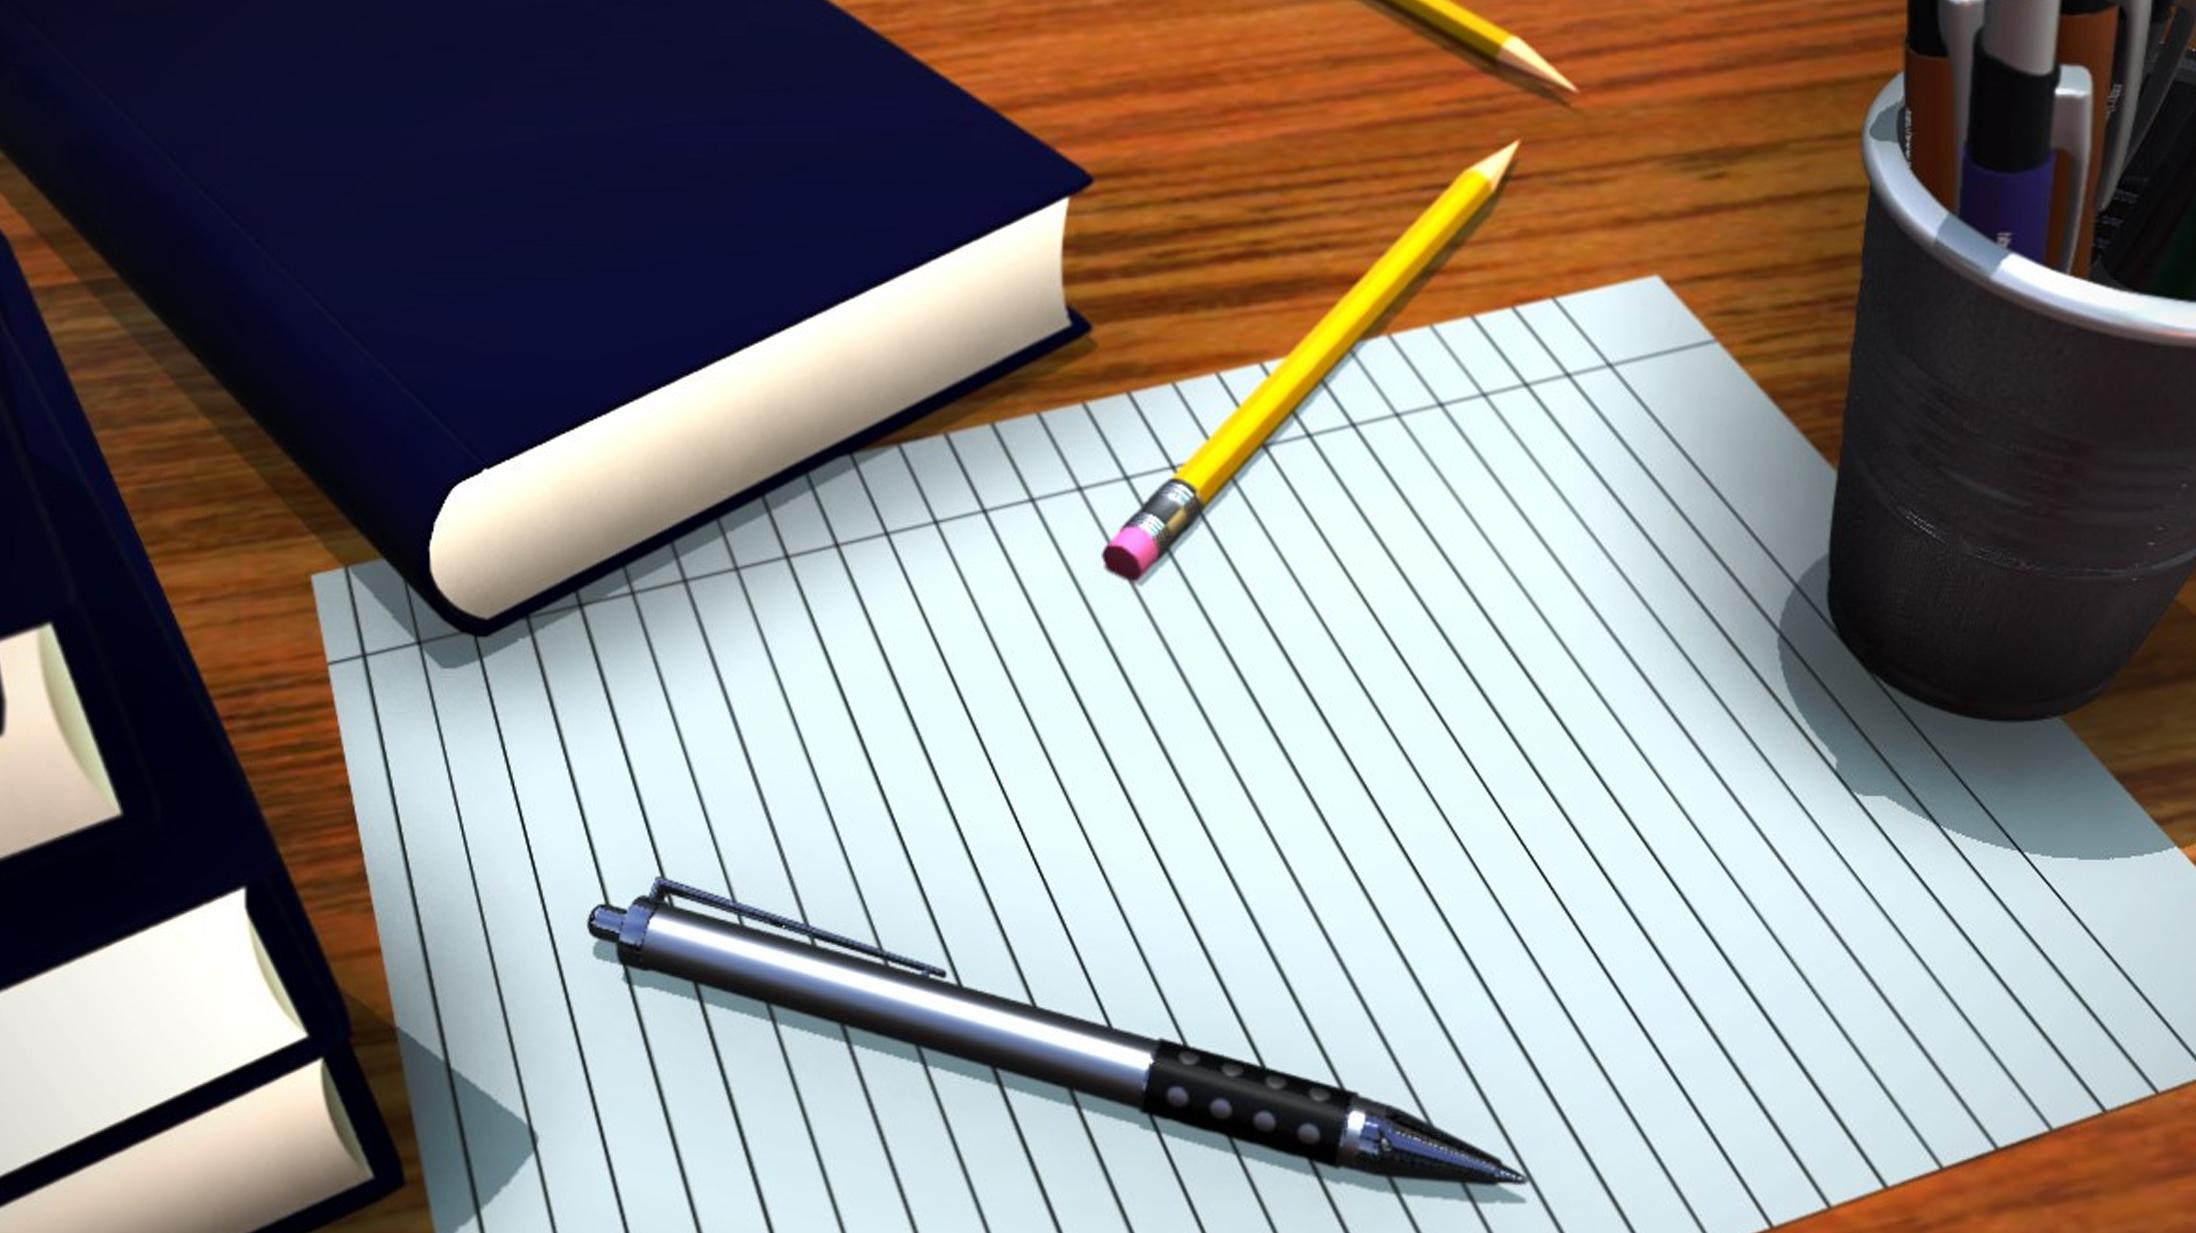 School Generic FOR WEB_1468533357027.jpg